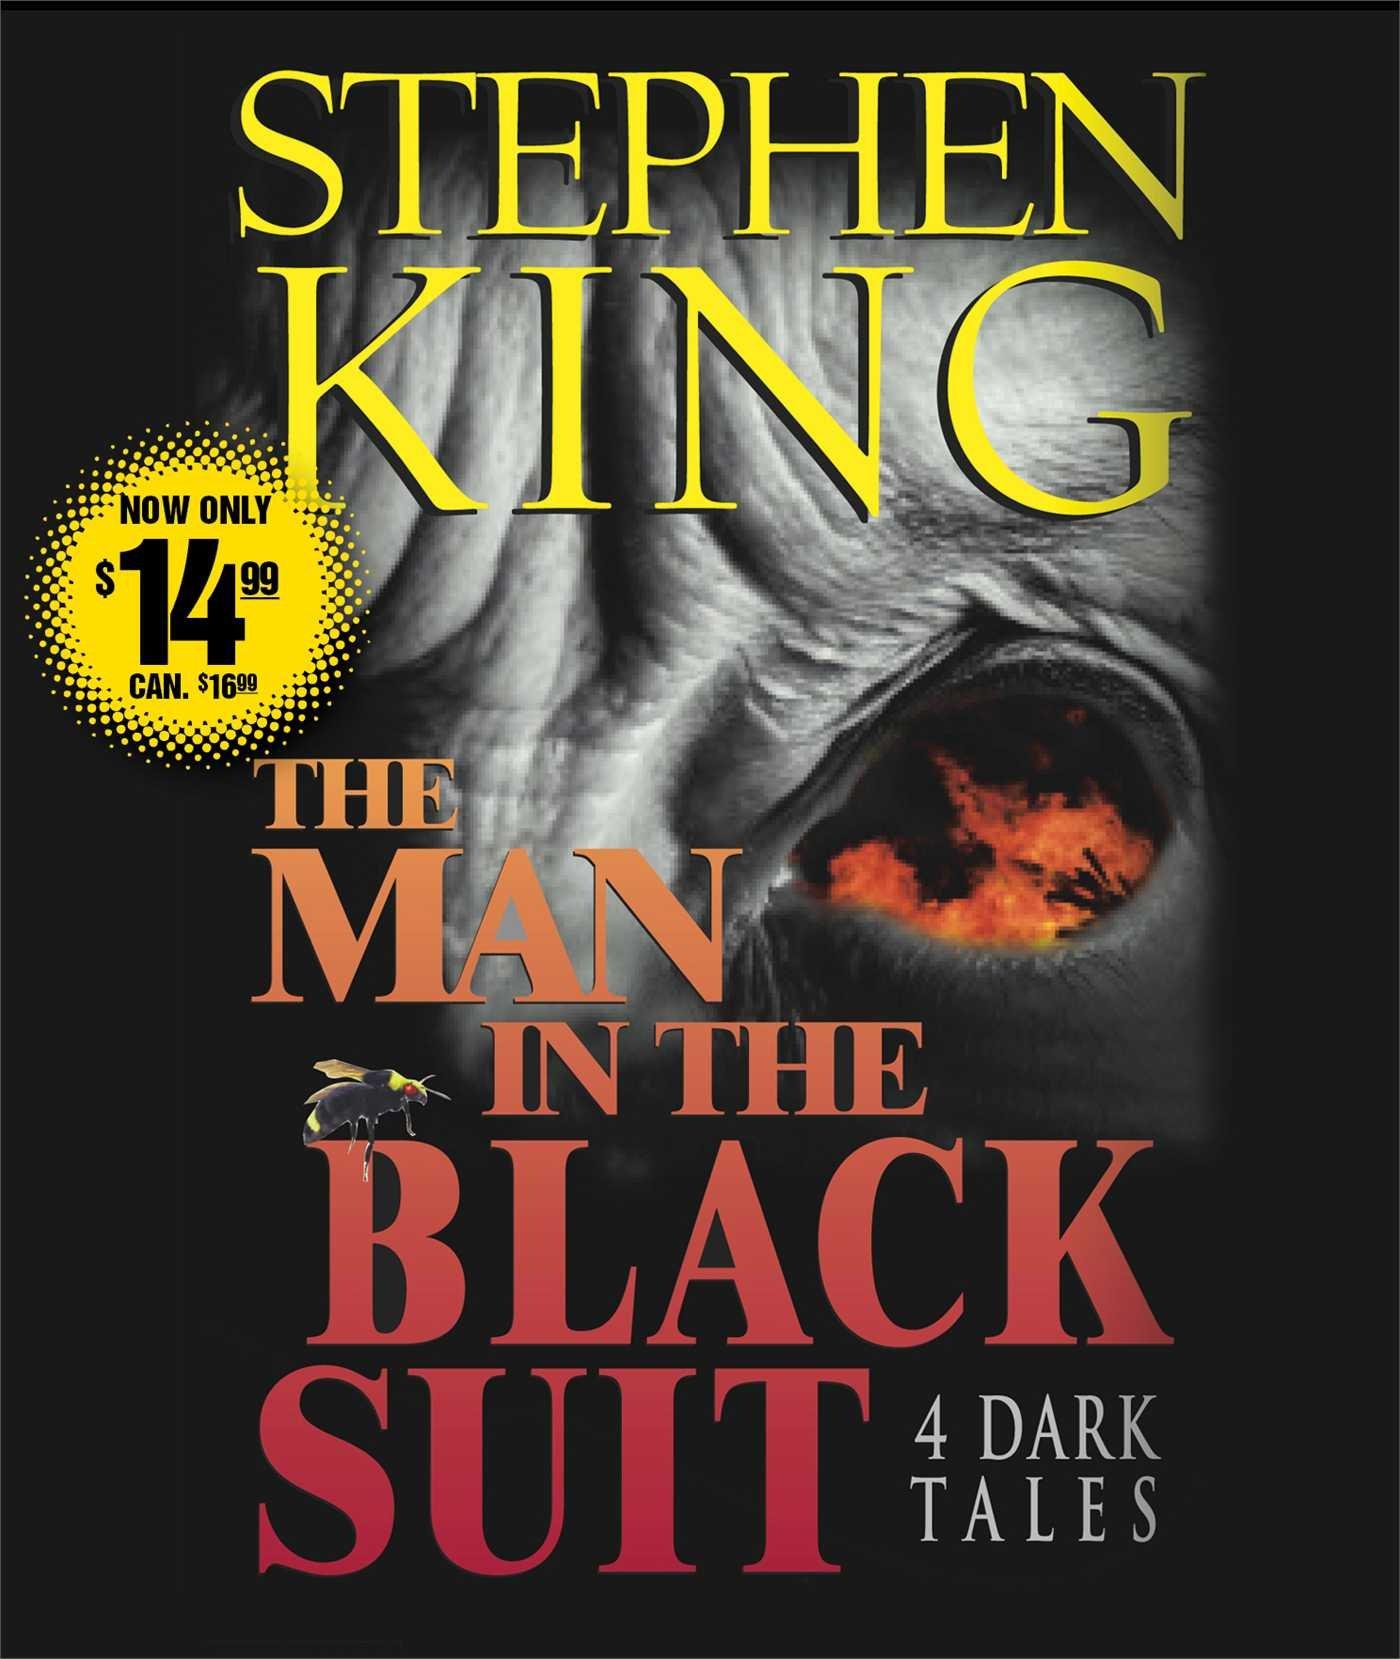 The Man in the Black Suit : 4 Dark Tales: Stephen King, John ...